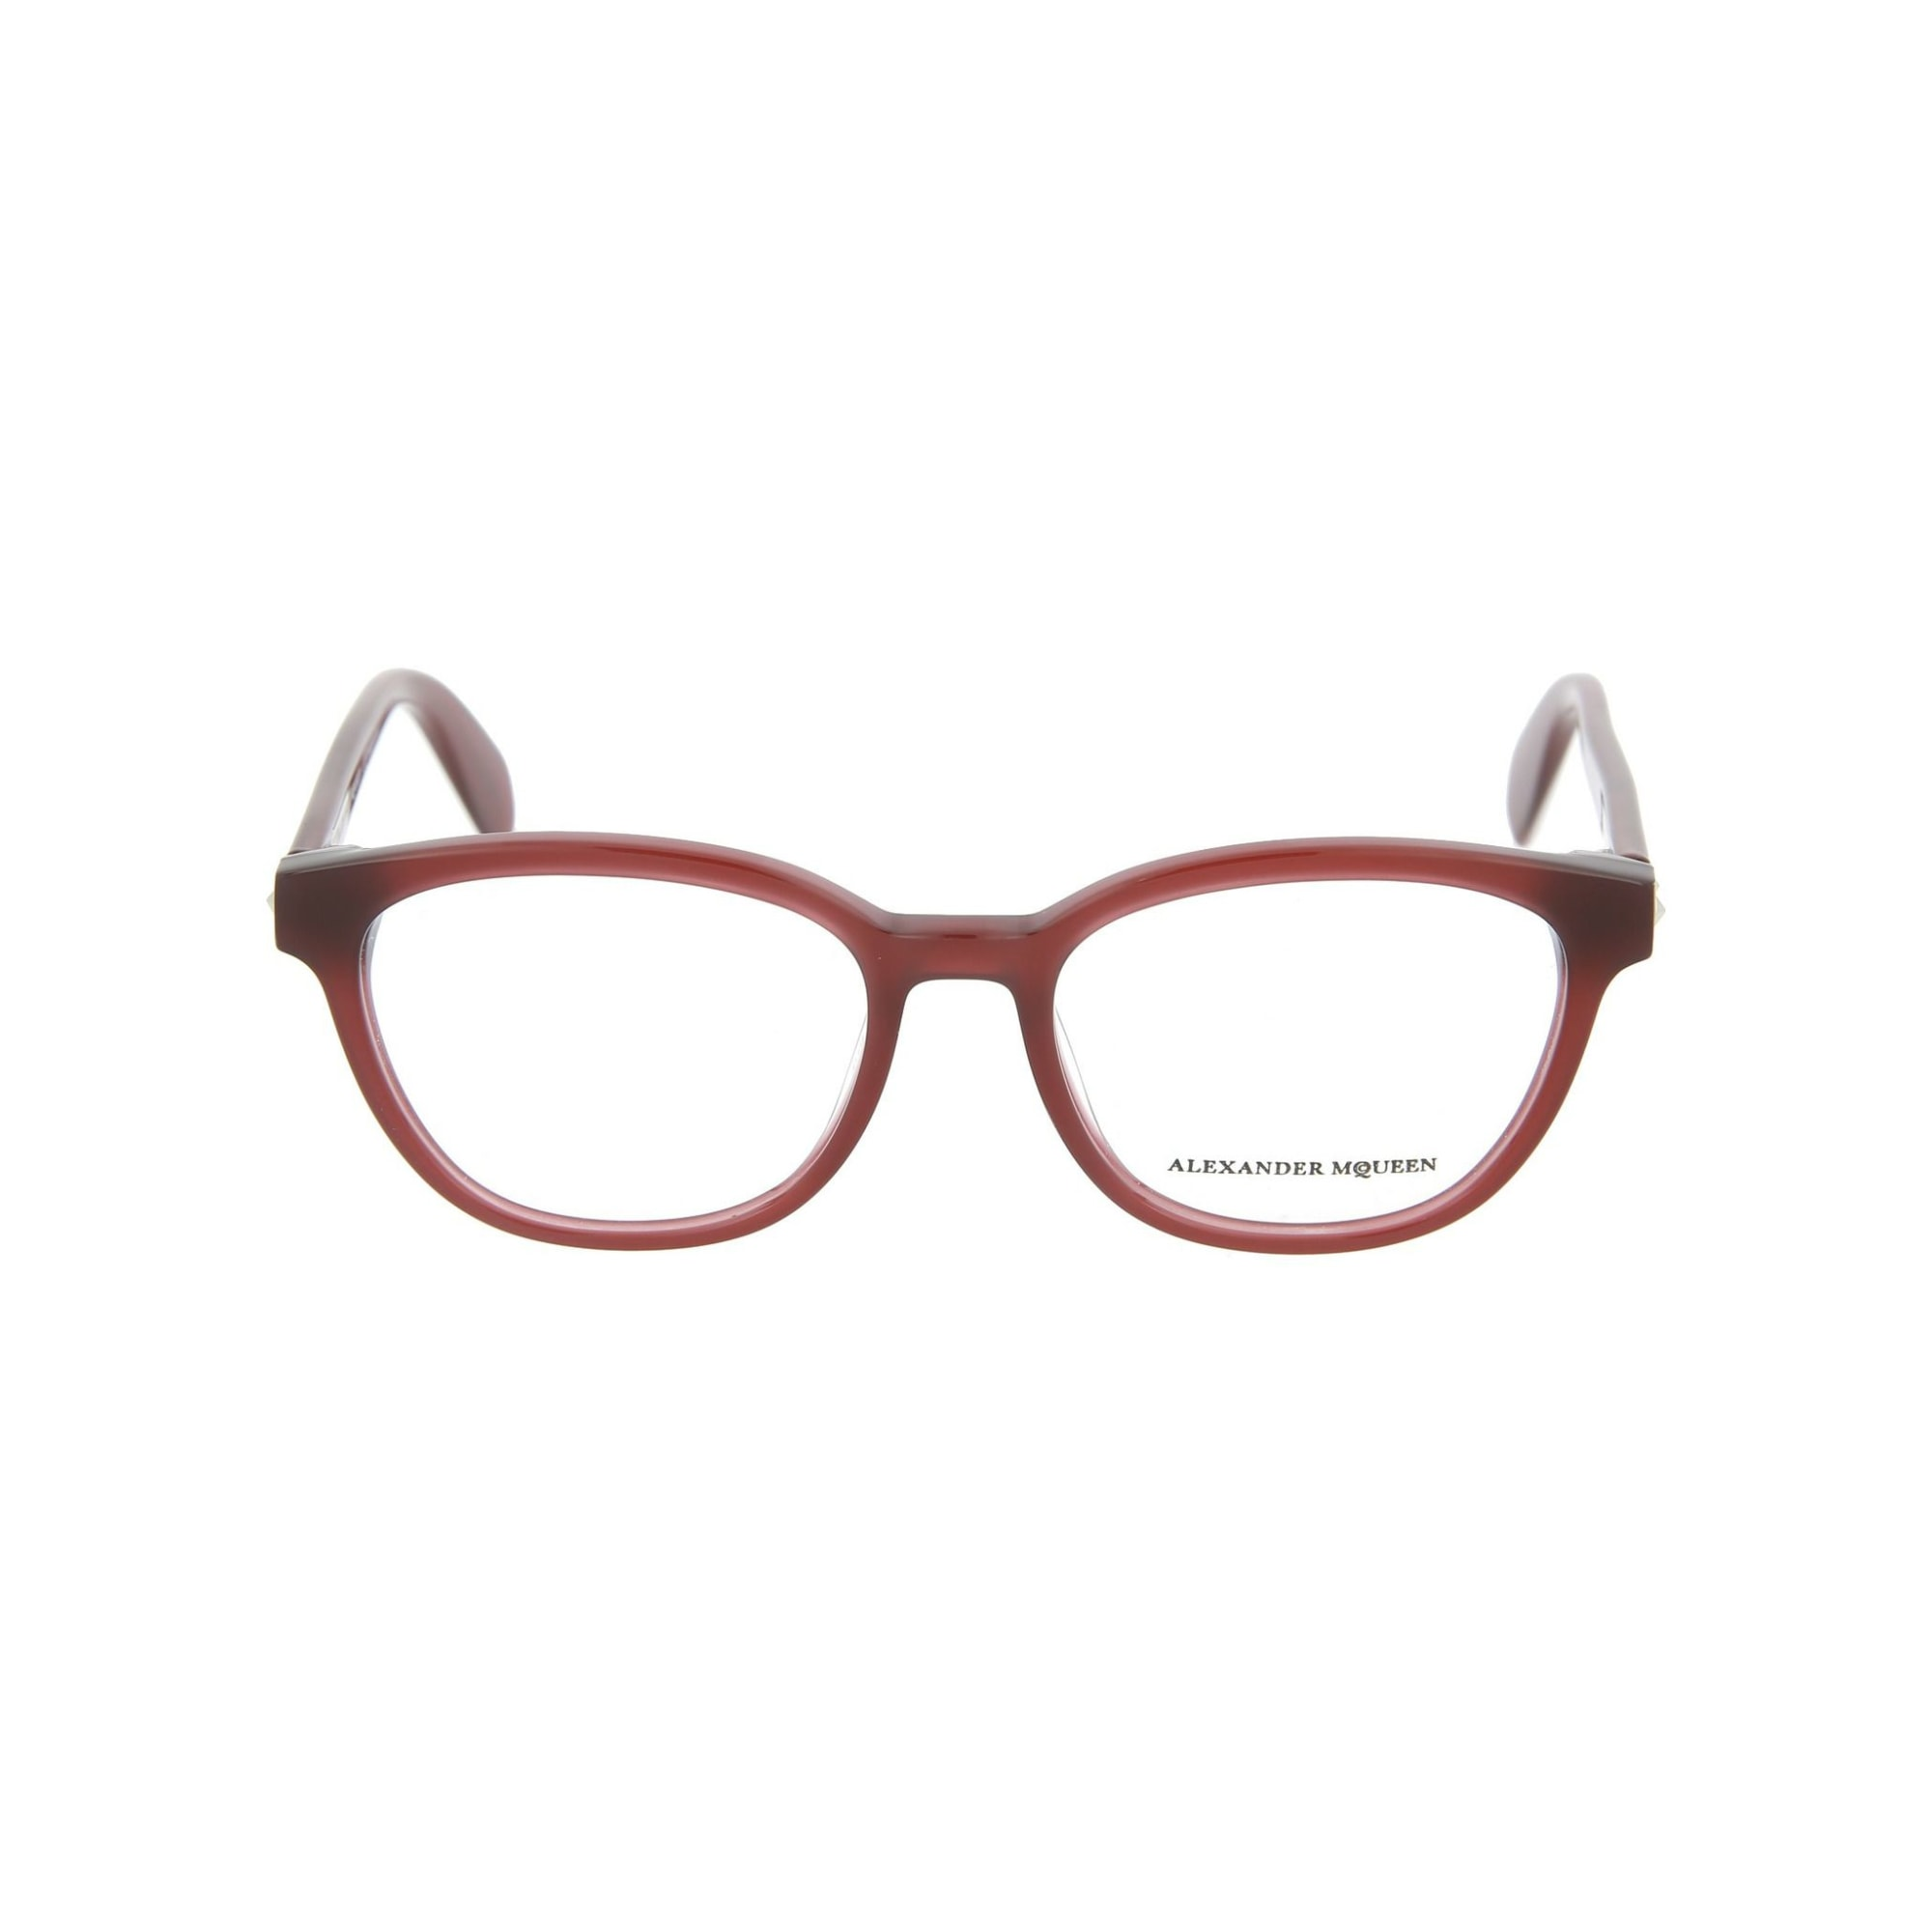 Eyeglass Frames ALEXANDER MCQUEEN White, off-white, ecru